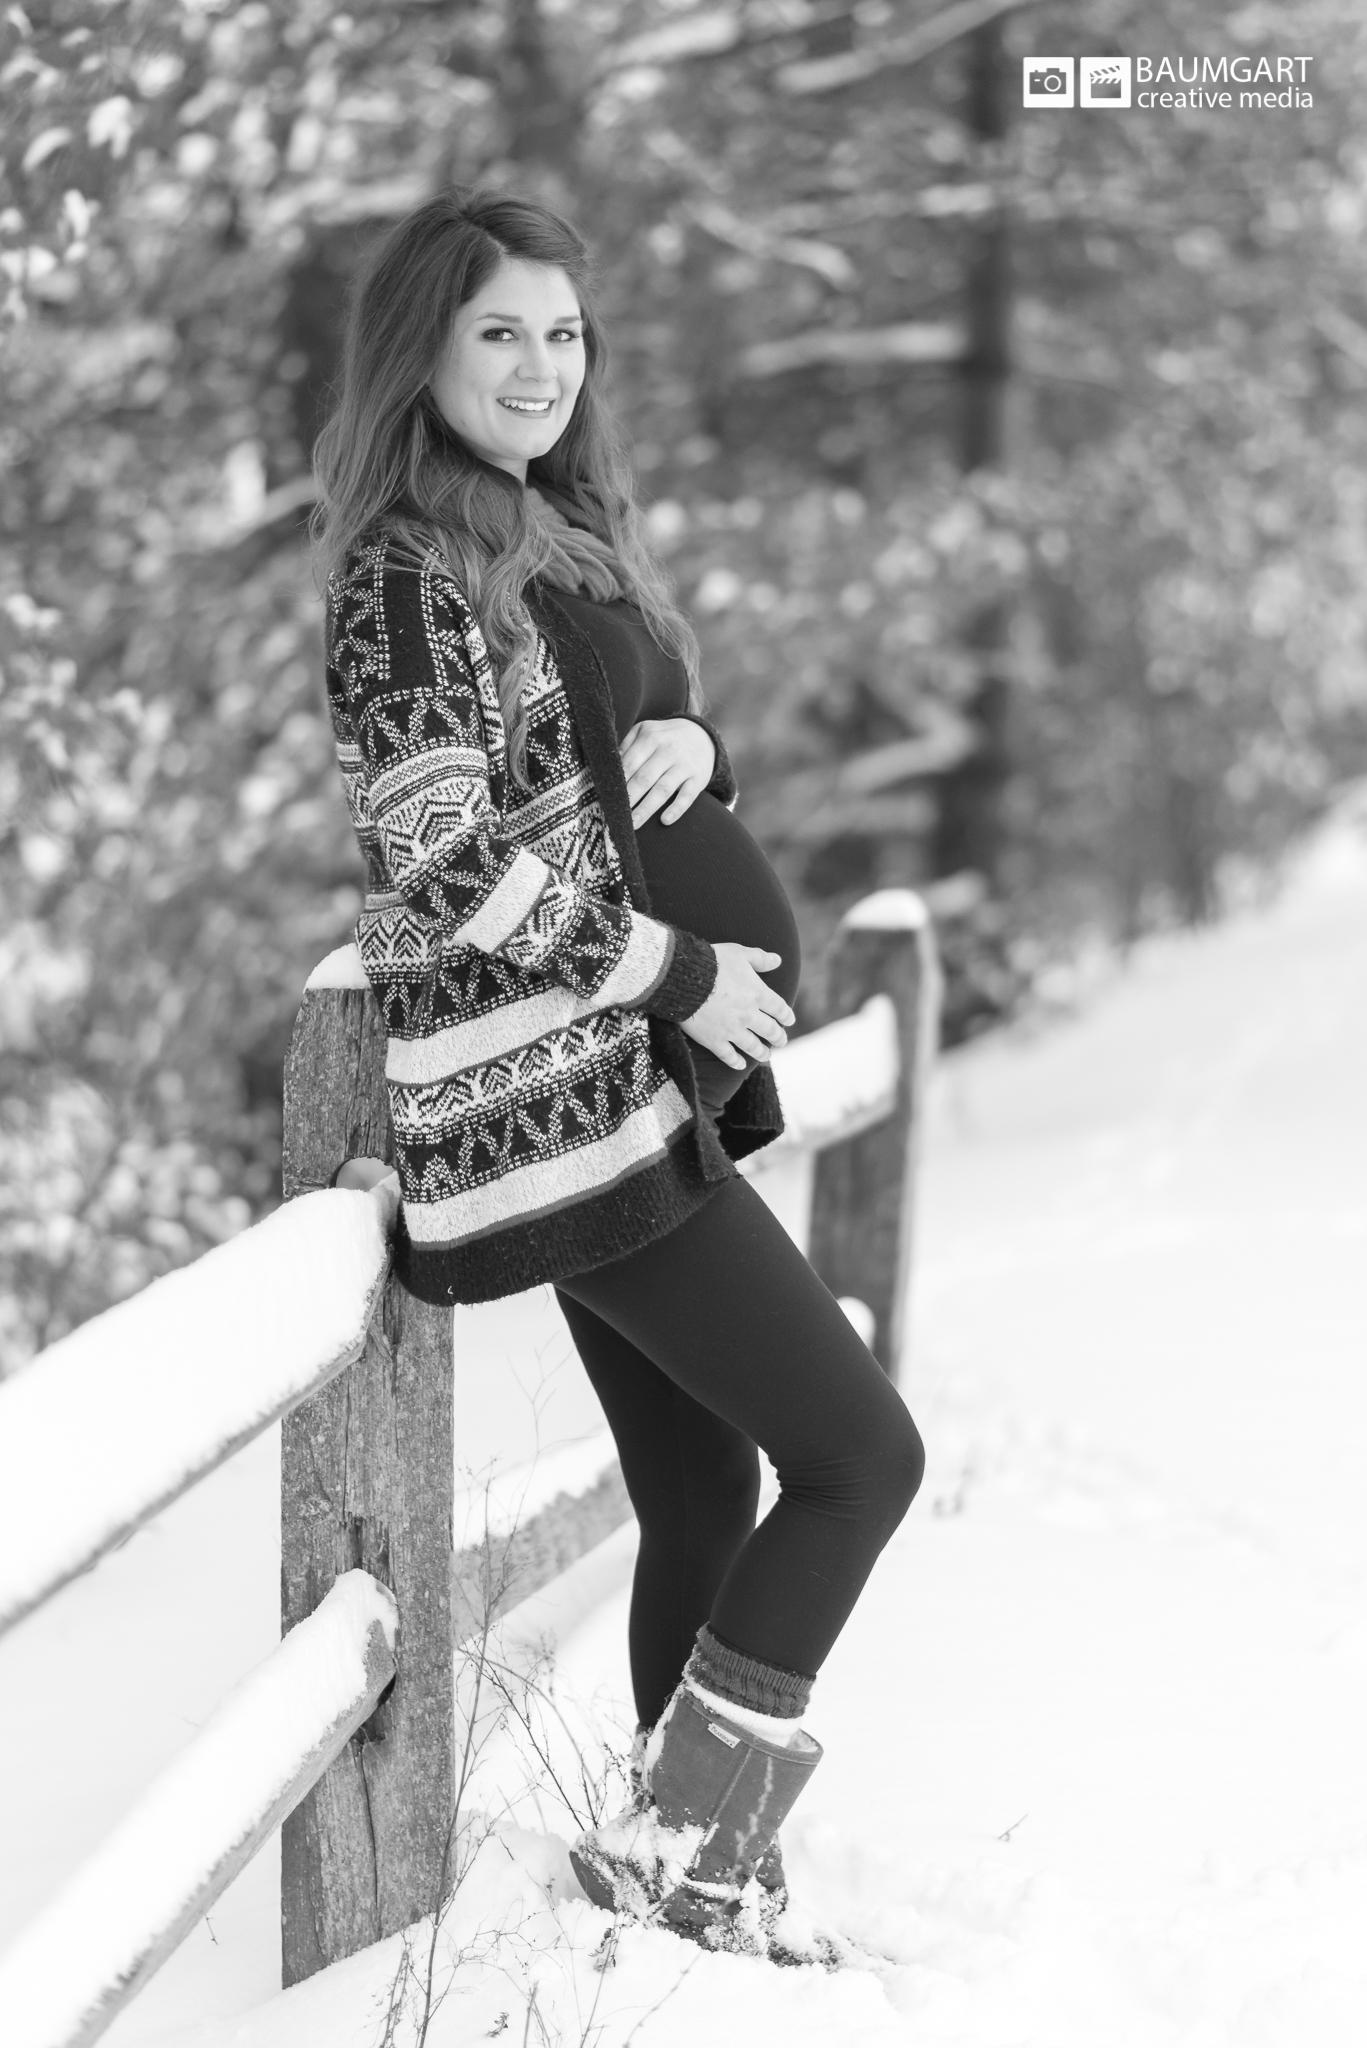 MA_Winter_Maternity_Portrait_Photography_Jeff_Baumgart_Creative_Media